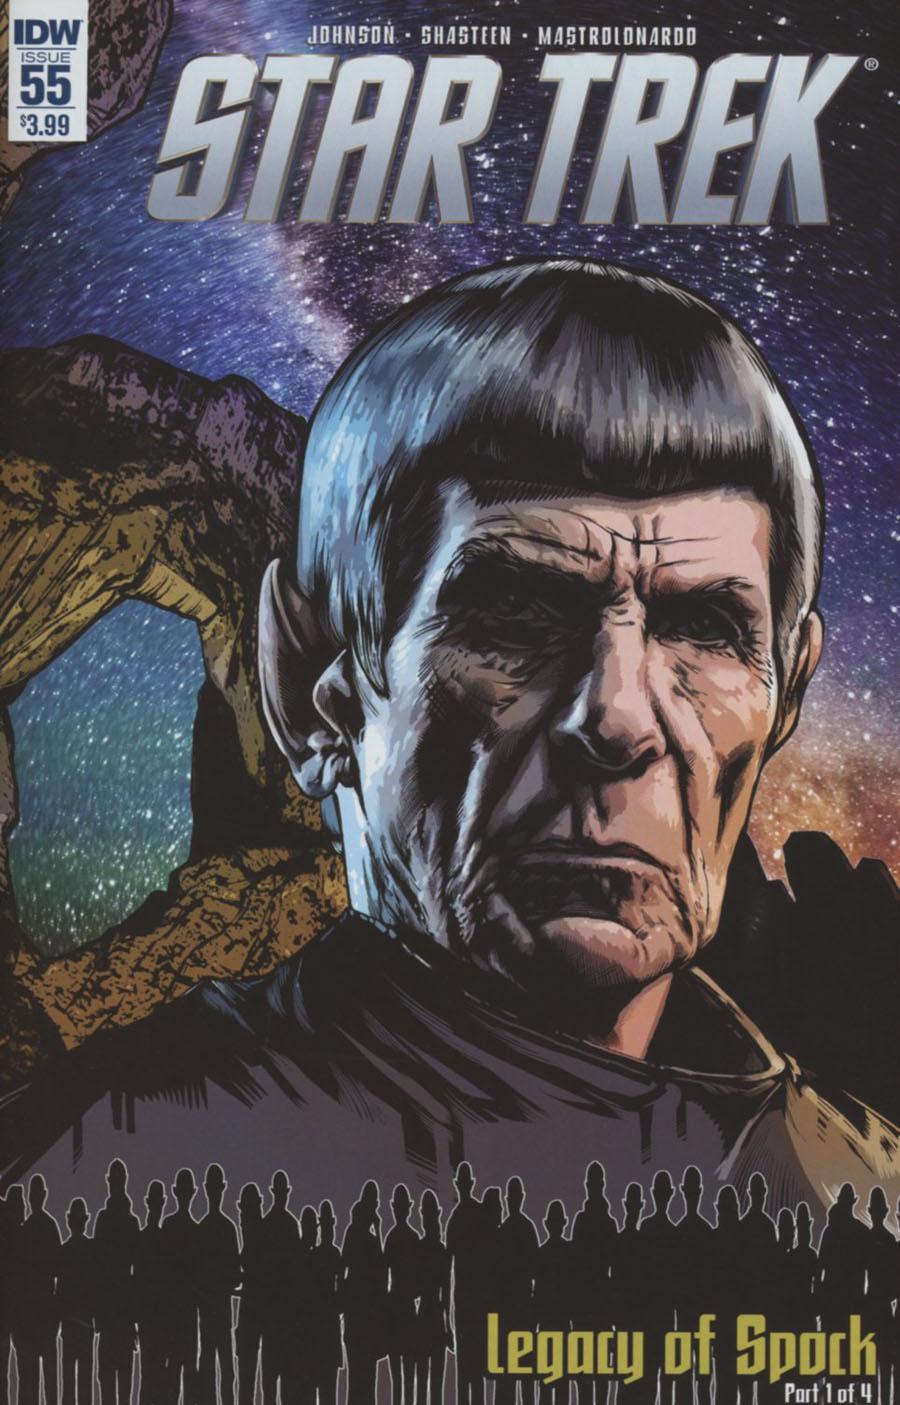 Star Trek (IDW) #55 Cover A Regular Tony Shasteen Cover